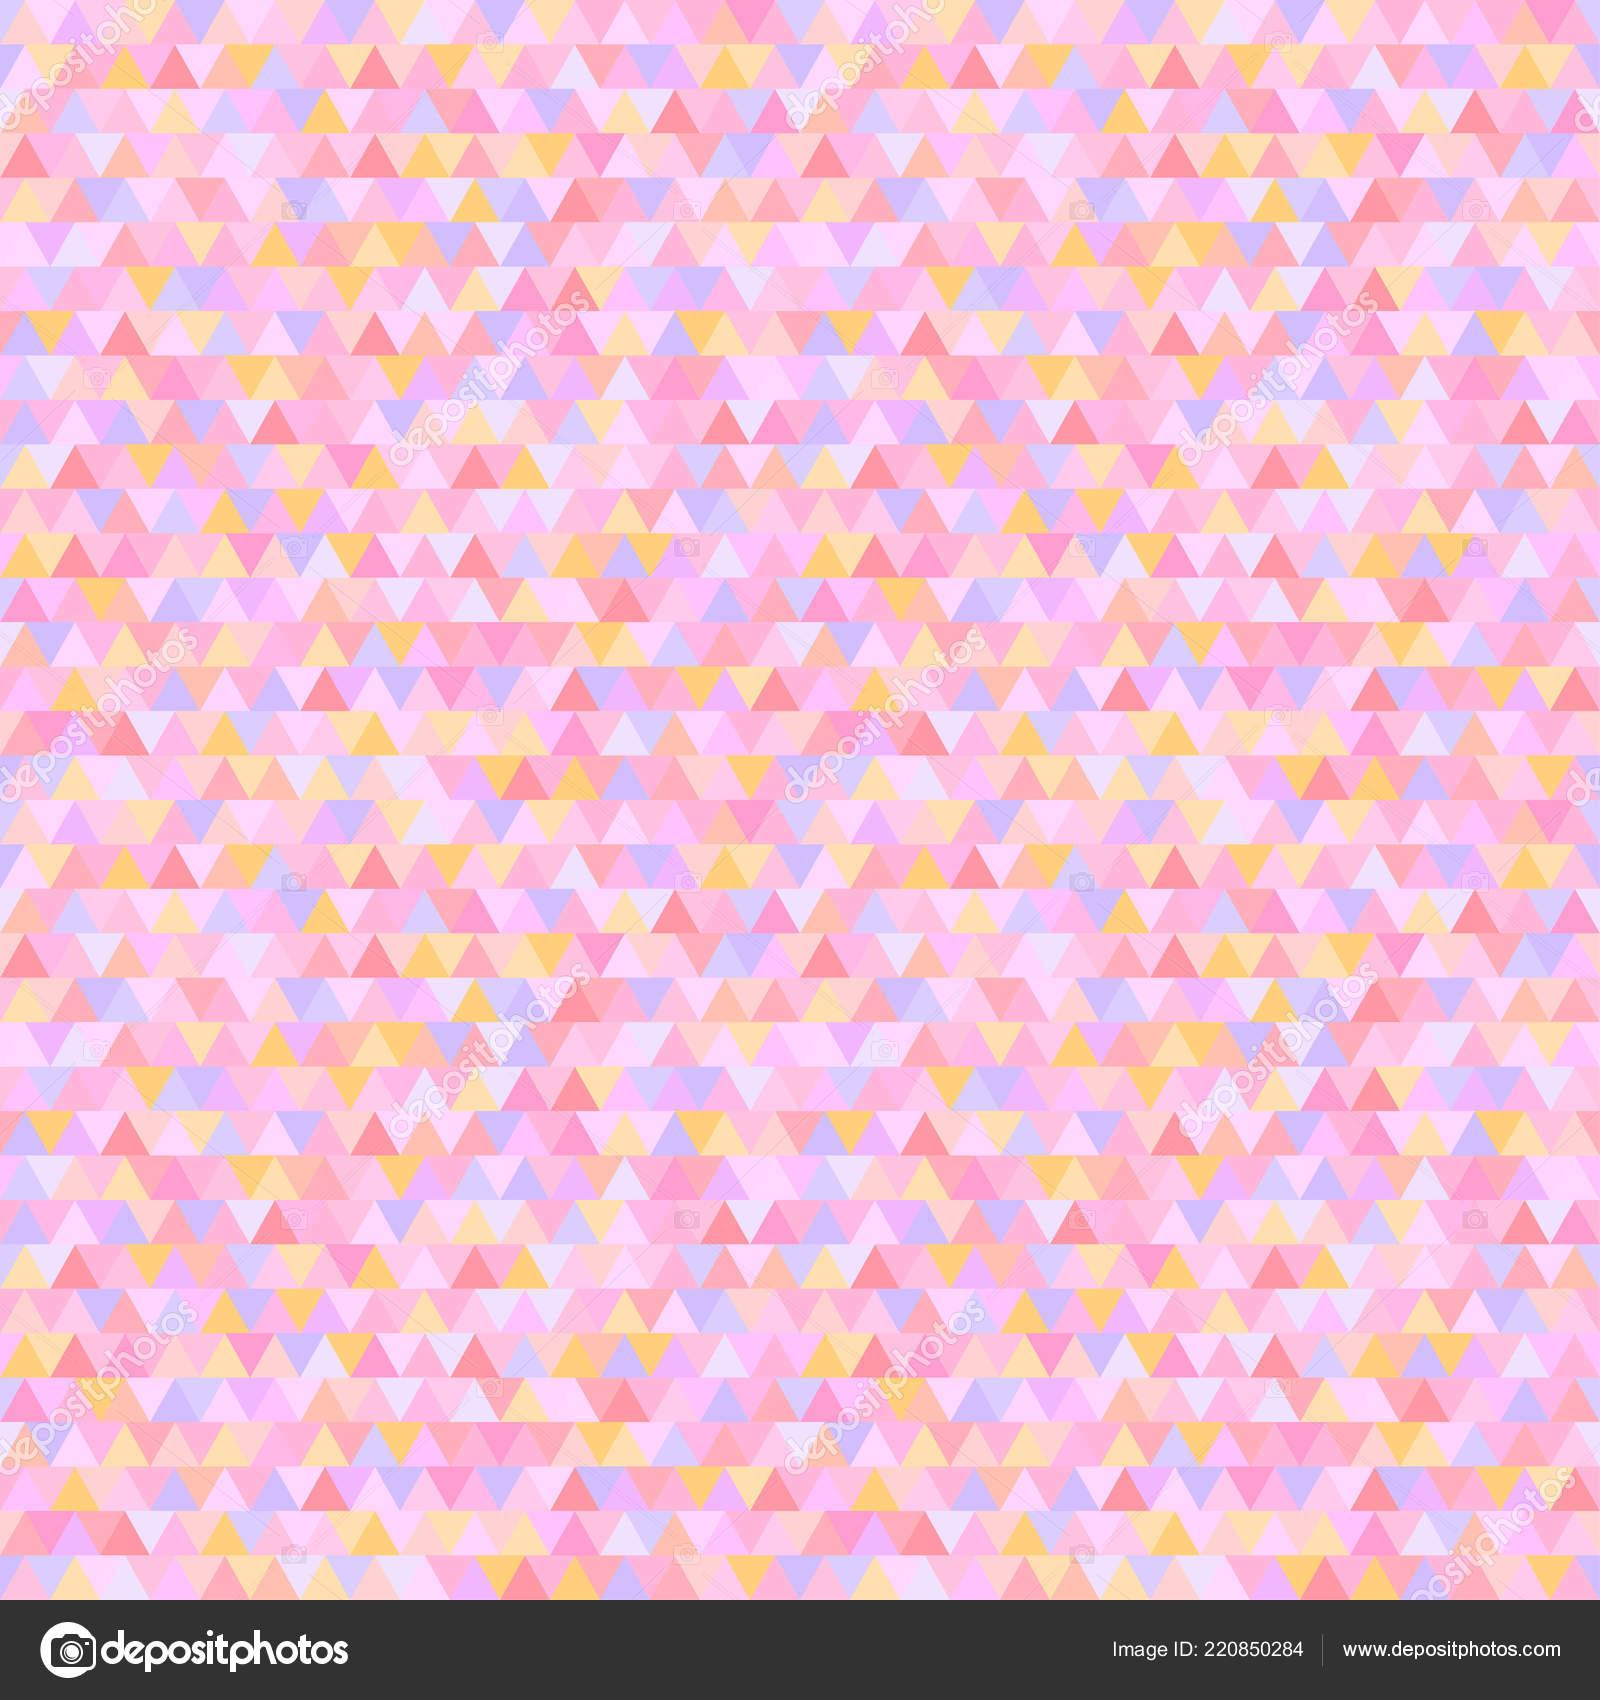 Seamless Triangle Pattern Abstract Geometric Wallpaper